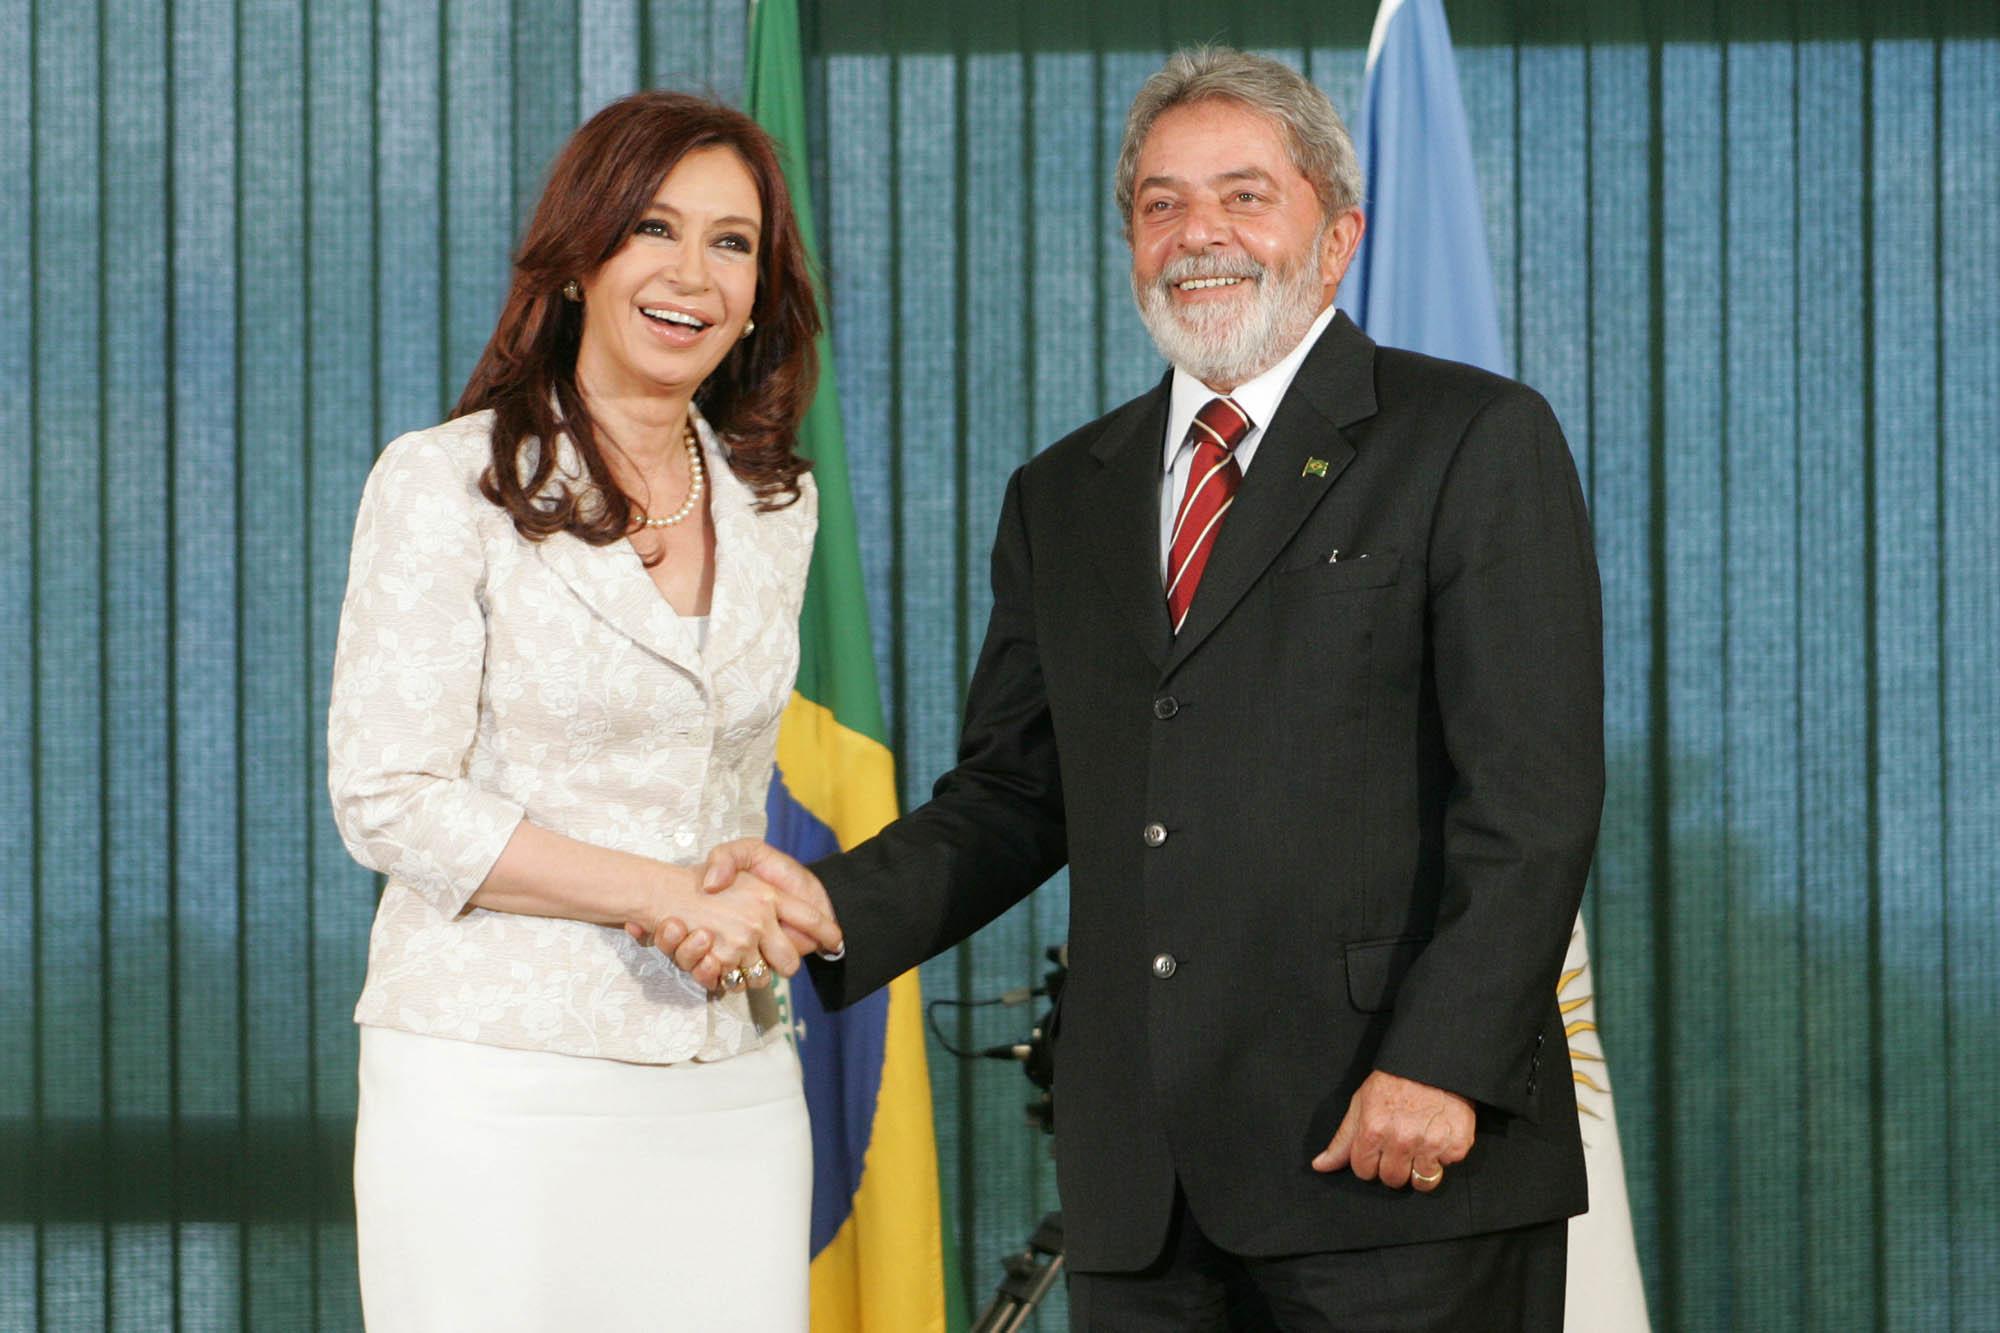 Cristina Kirchner e Luís Inácio Lula da Silva. Foto: Presidencia de La Nacion Argentina